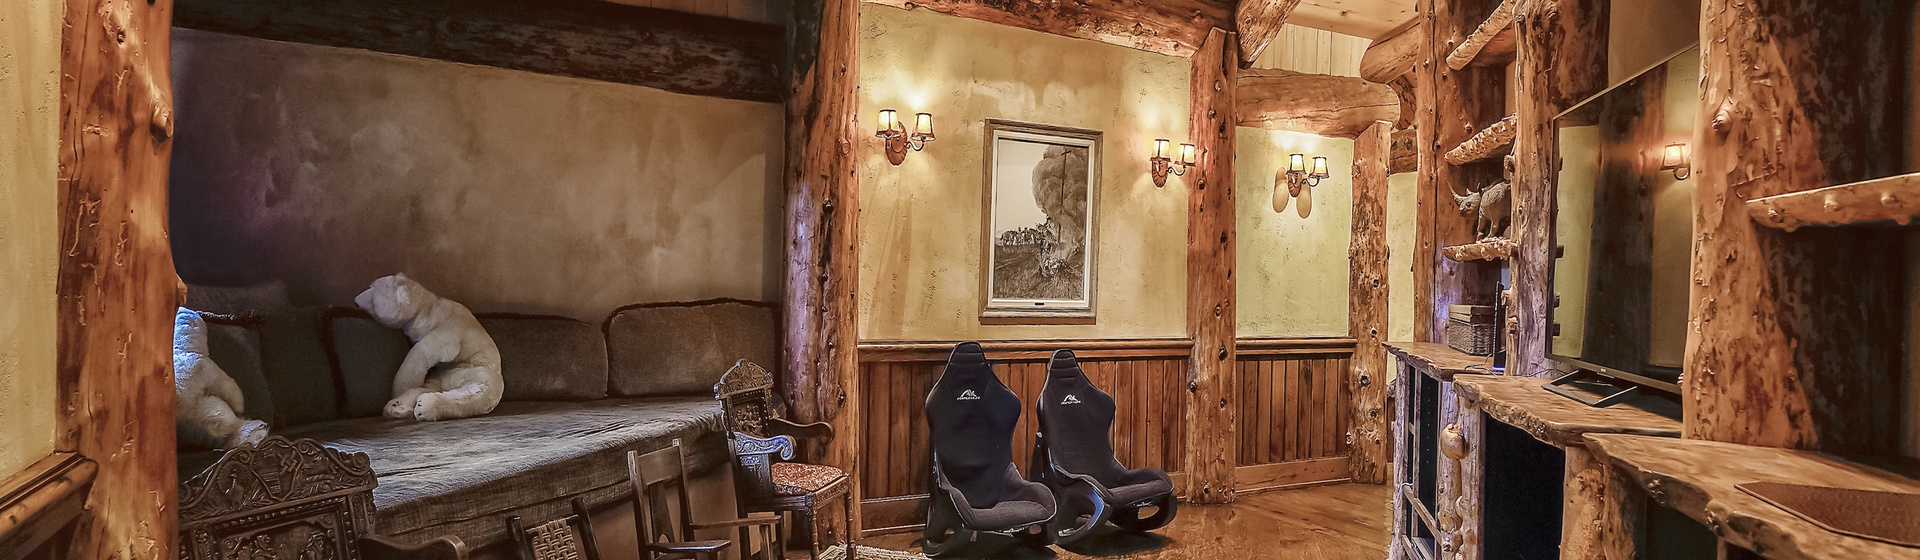 6.6-Telluride-Sleeping-Indian-Ranch-second-floor-sitting-area-2-web.JPG